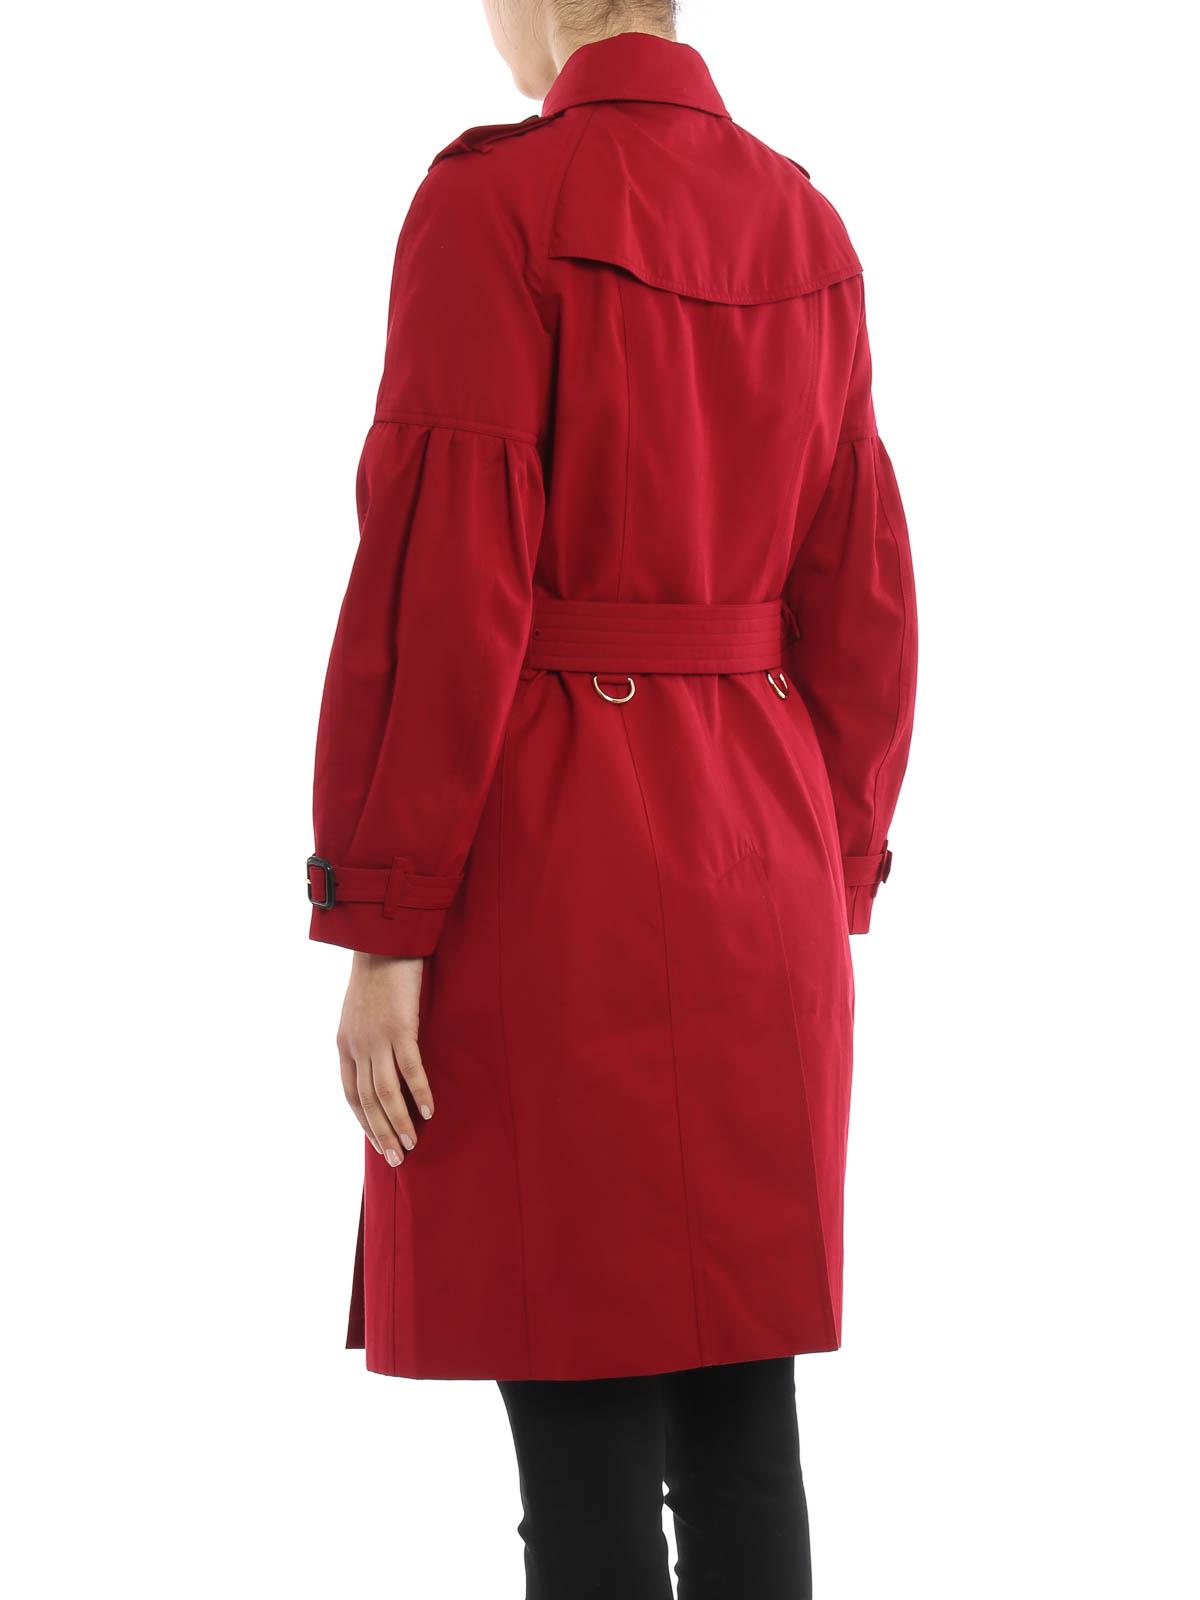 burberry trenchcoat fur damen rot trenchcoats 4043804. Black Bedroom Furniture Sets. Home Design Ideas